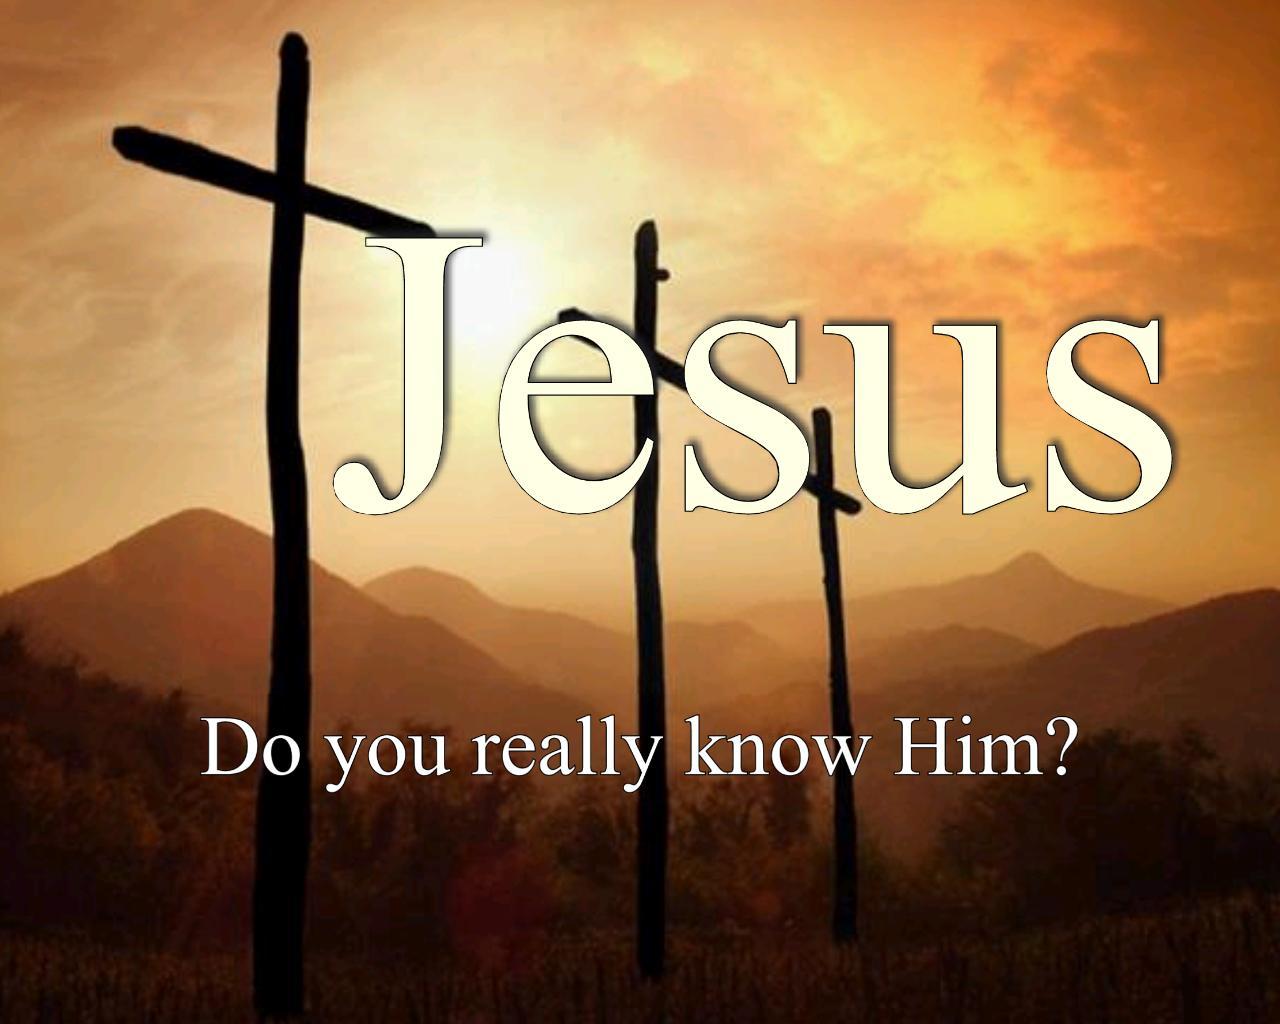 http://2.bp.blogspot.com/-m-ekqyWmbLw/Ta7gopKM3oI/AAAAAAAAM0Y/EeVV-xaG9PA/s1600/Knowing_Jesus.6243317.jpg